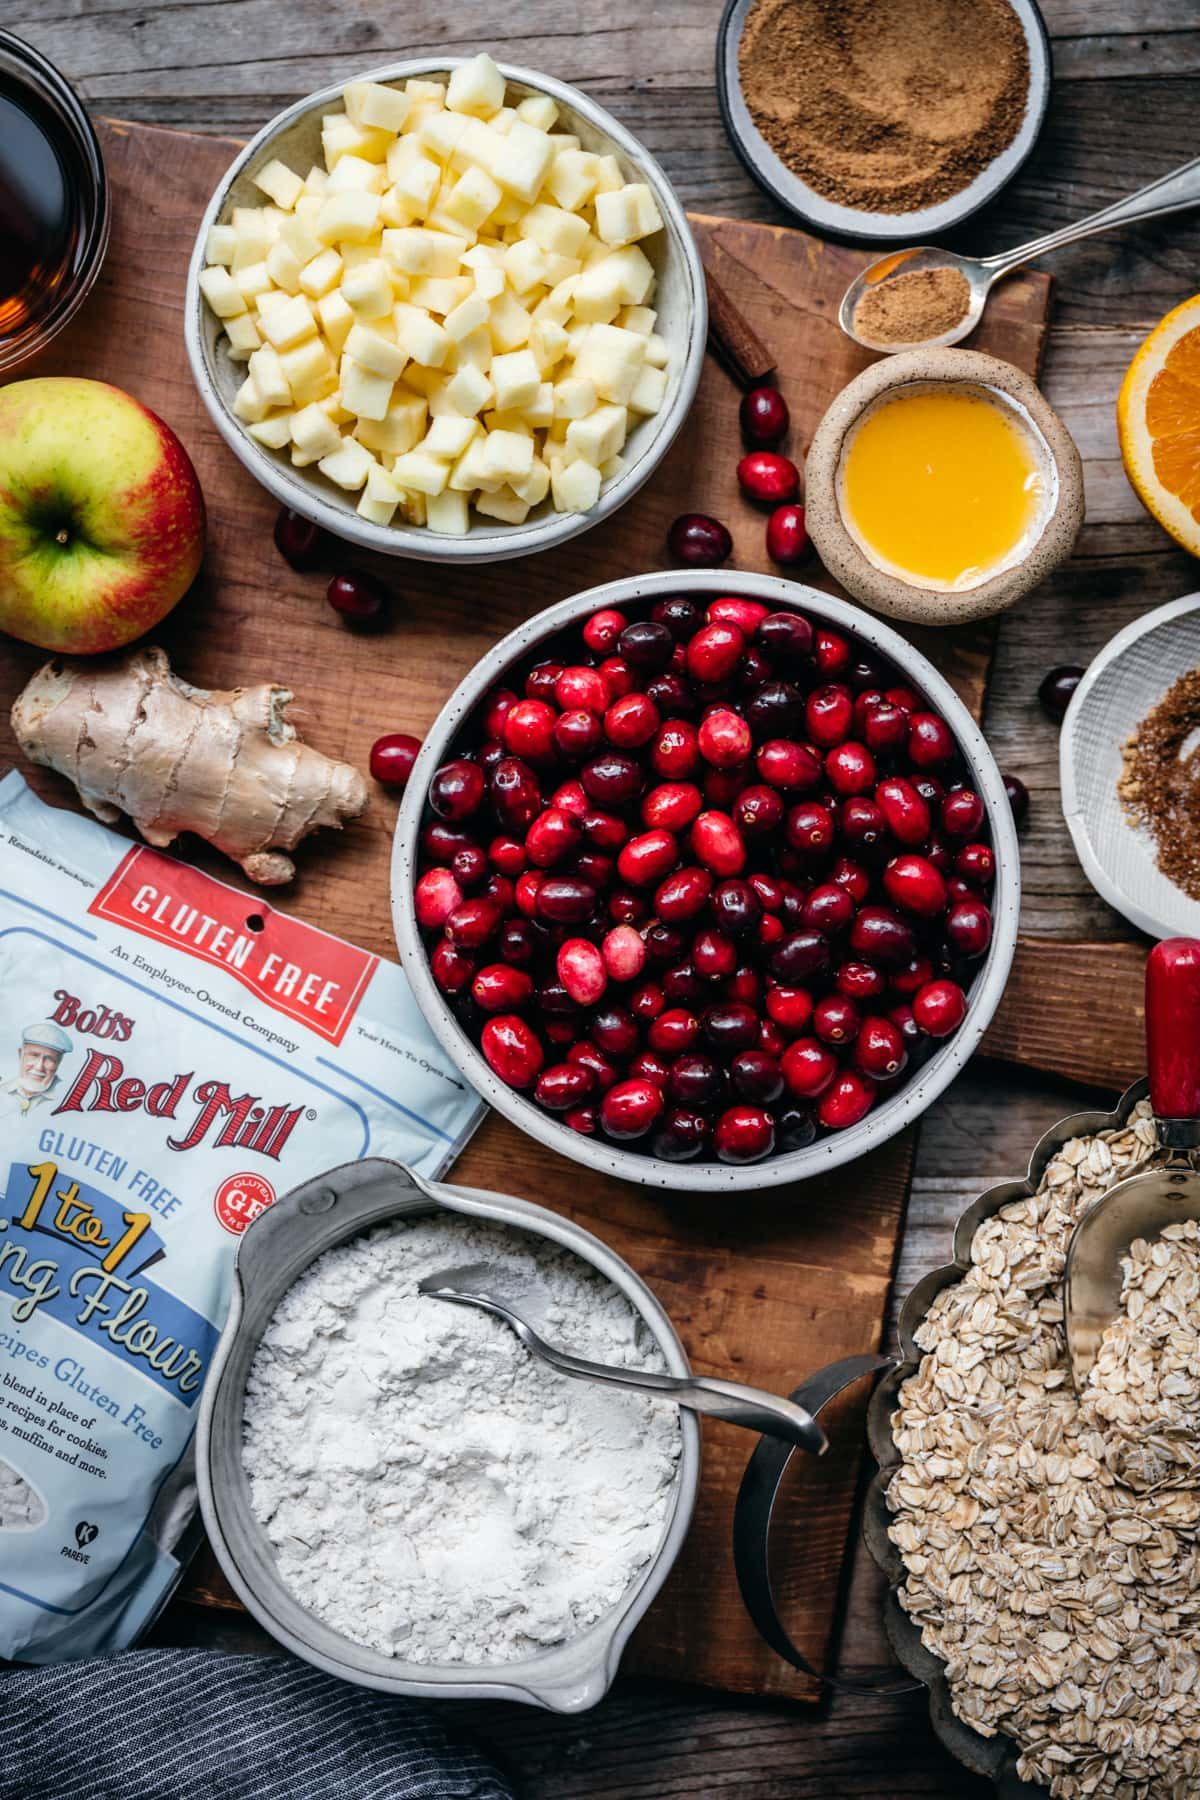 overhead view of ingredients for cranberry crumb bars, including fresh cranberries, apples, orange juice, flour, oats, etc.